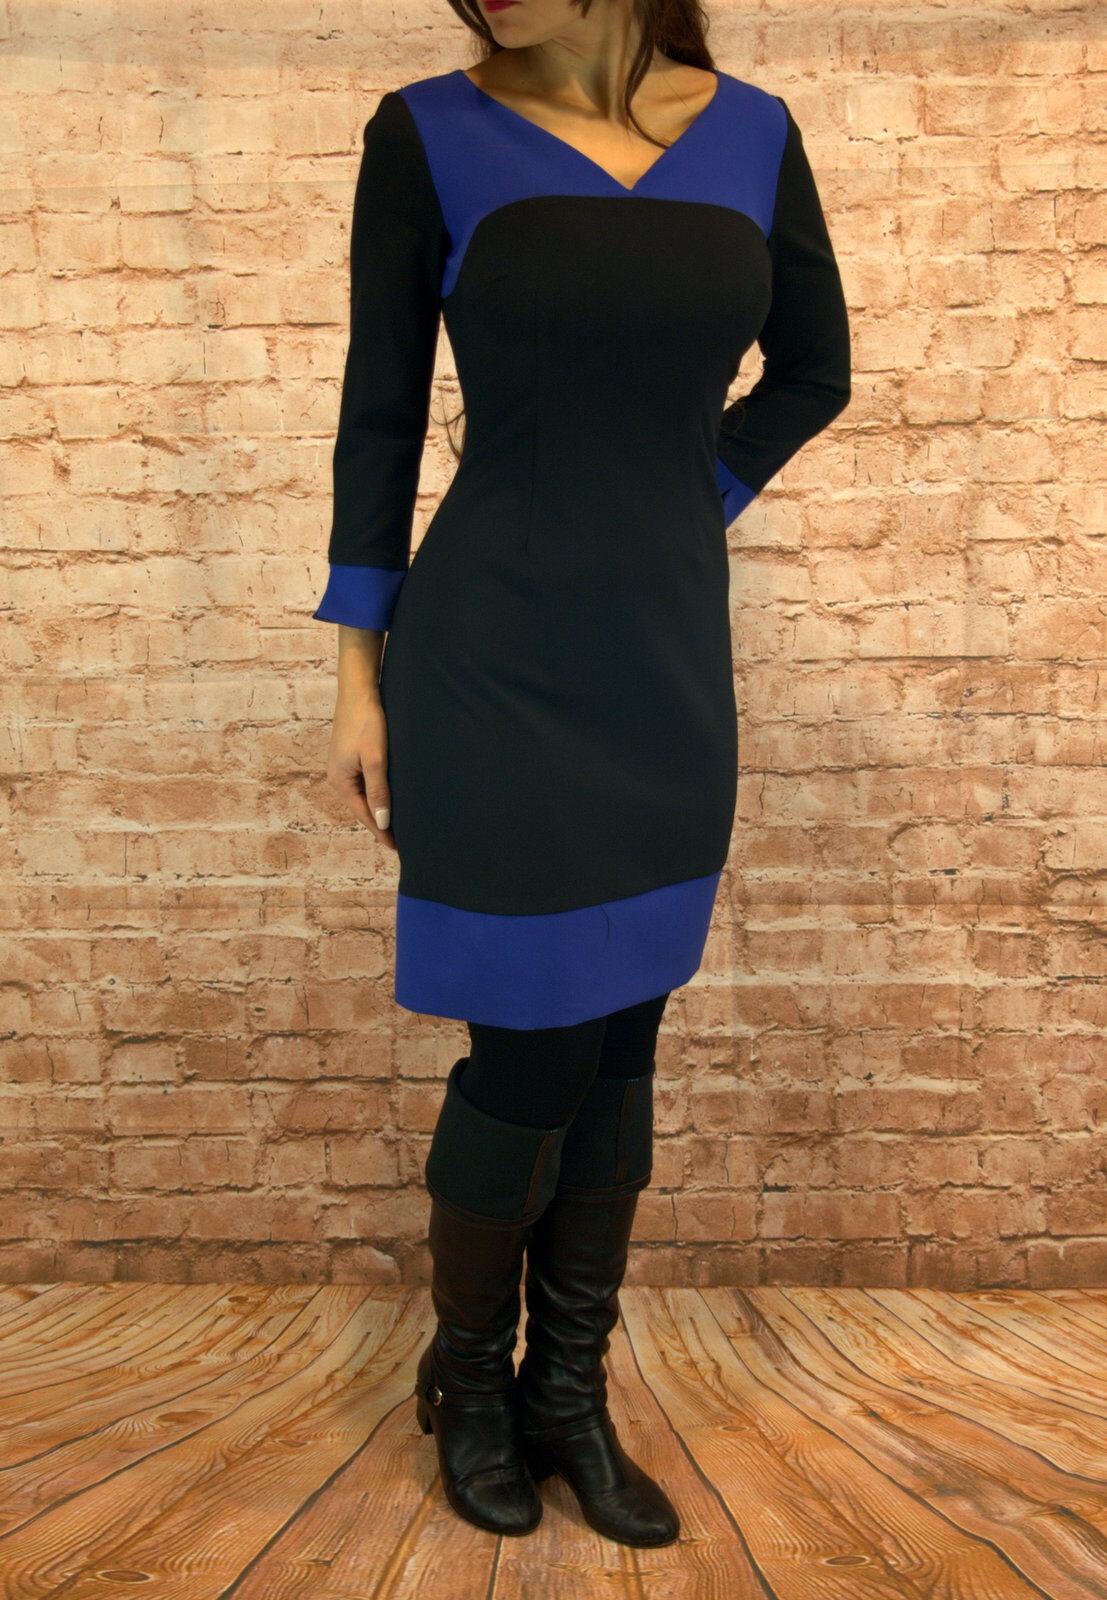 Abendkleid kurz Coctailkleid Herbst Winter Minikleid Kleid 3 4 Arm Gr. 36 38